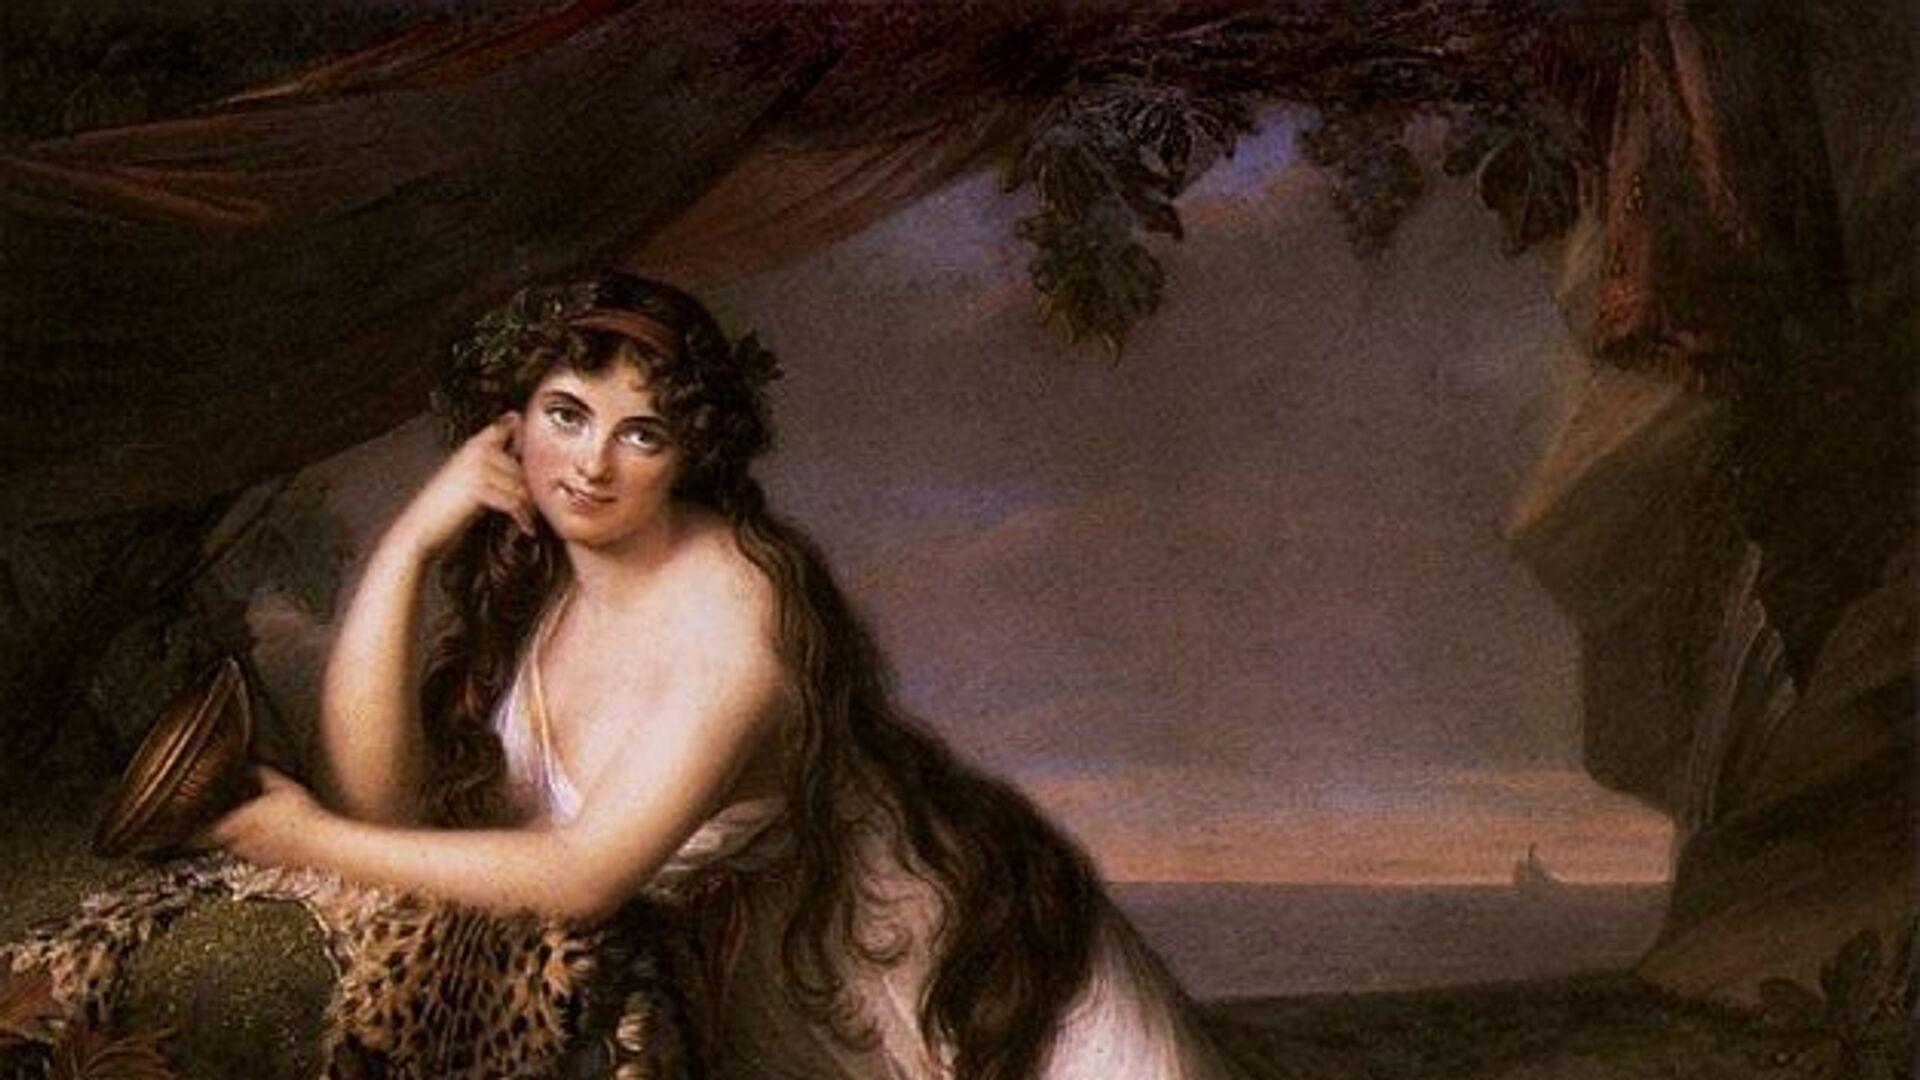 Элизабет Виже-Лебрен. Леди Эмма Гамильтон, 1790 - РИА Новости, 1920, 26.04.2020